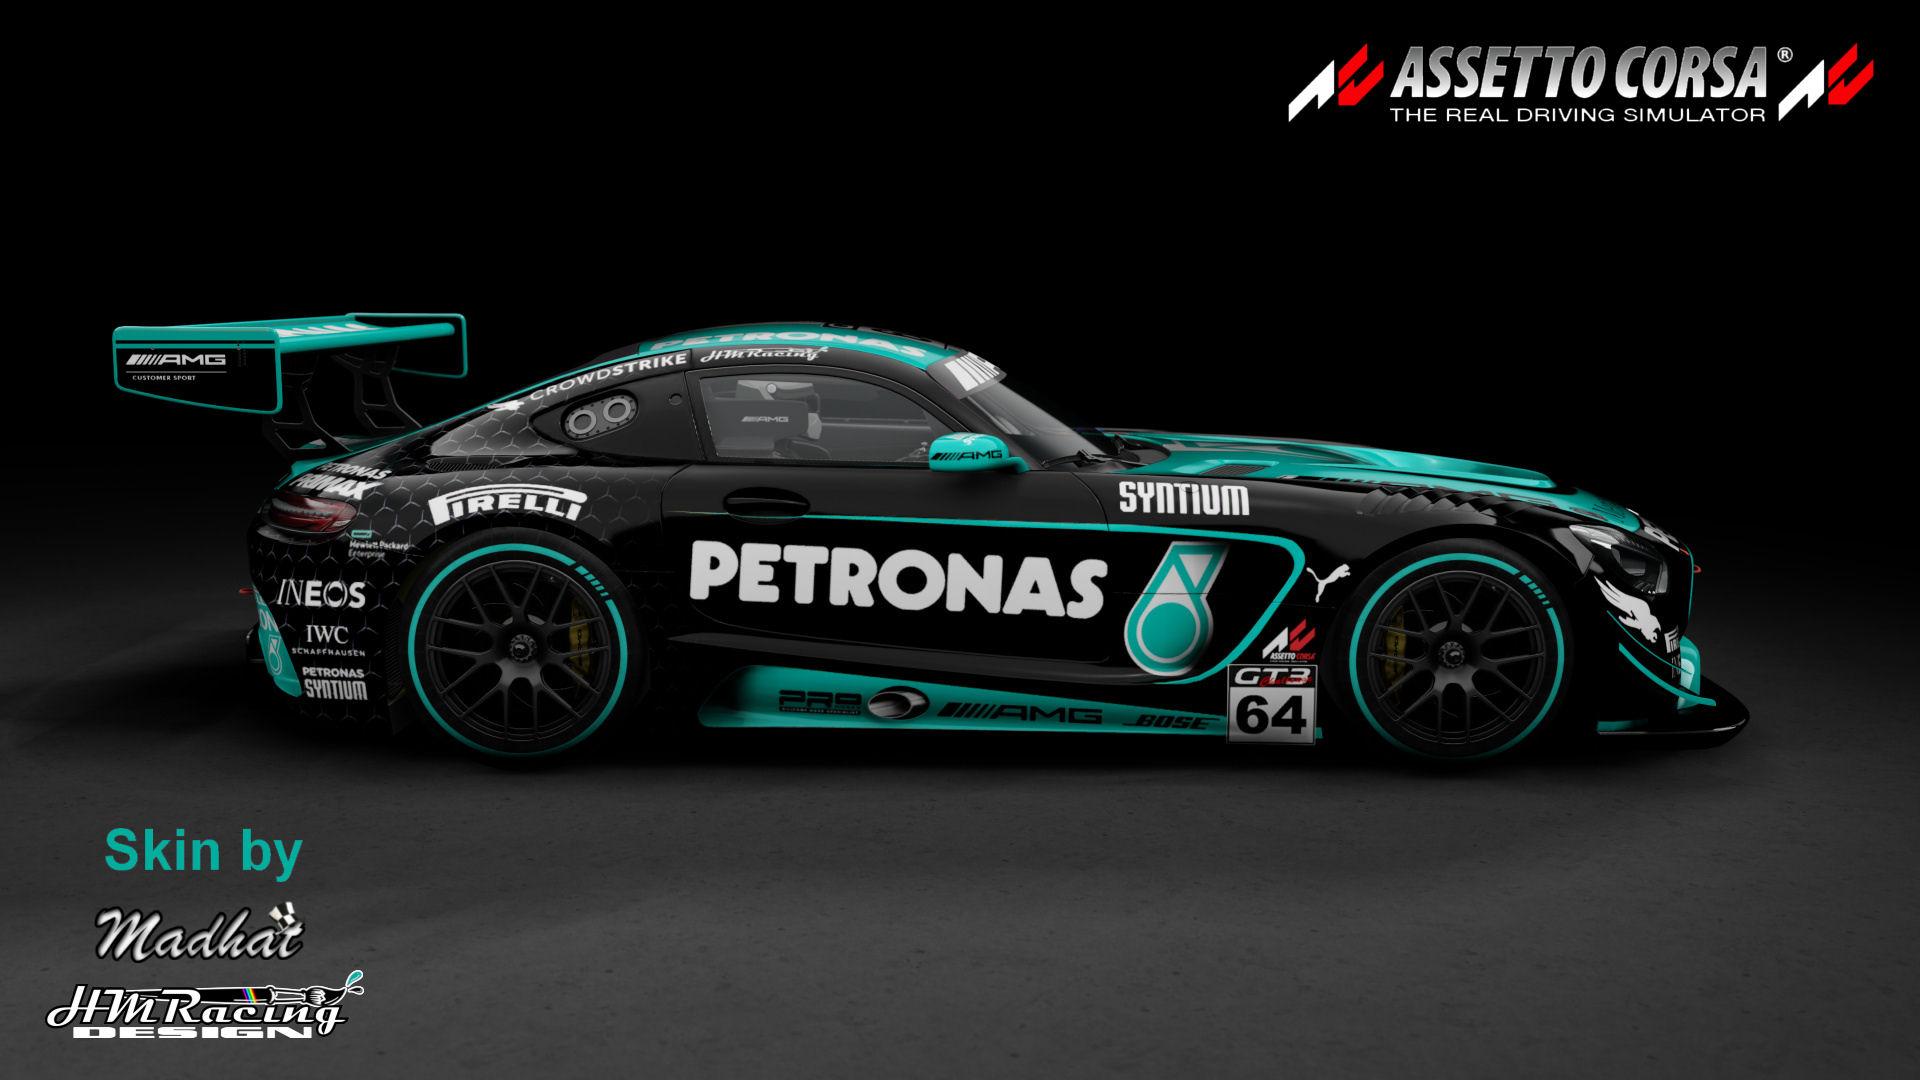 Mercedes AMG GT3 Petronas black 04.jpg